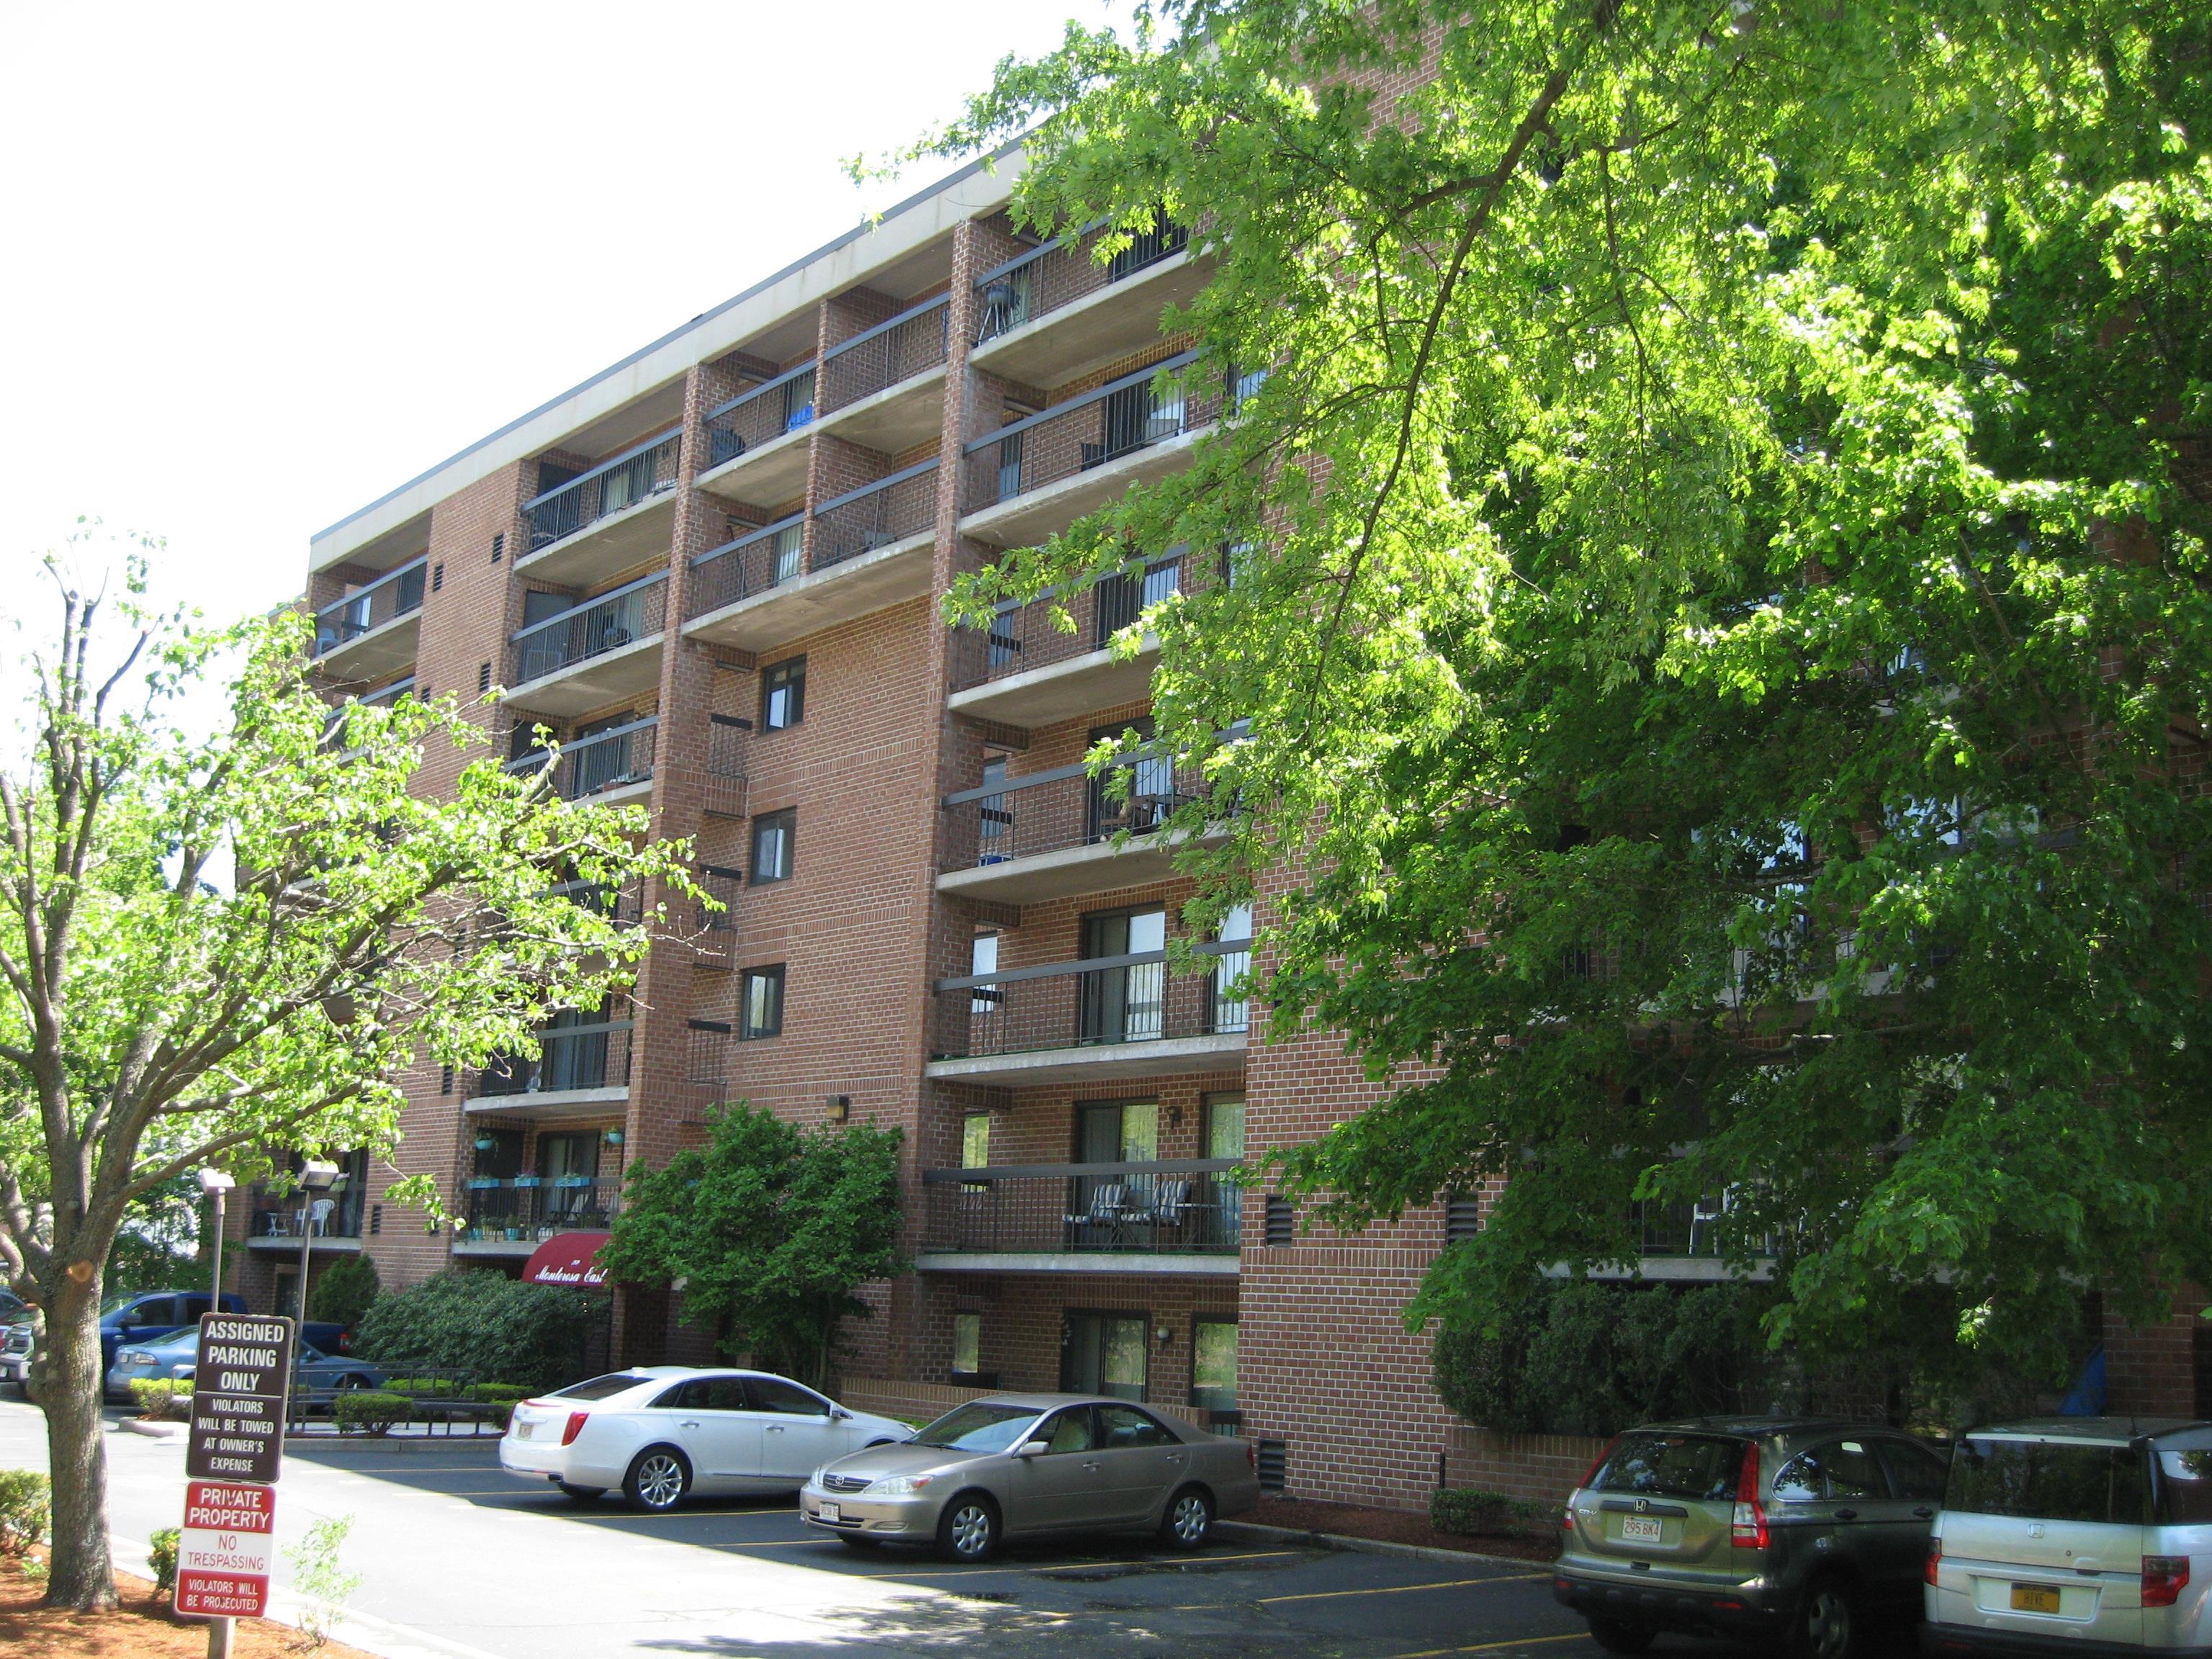 Malden Massachusetts Homes for Sale Boston area real estate